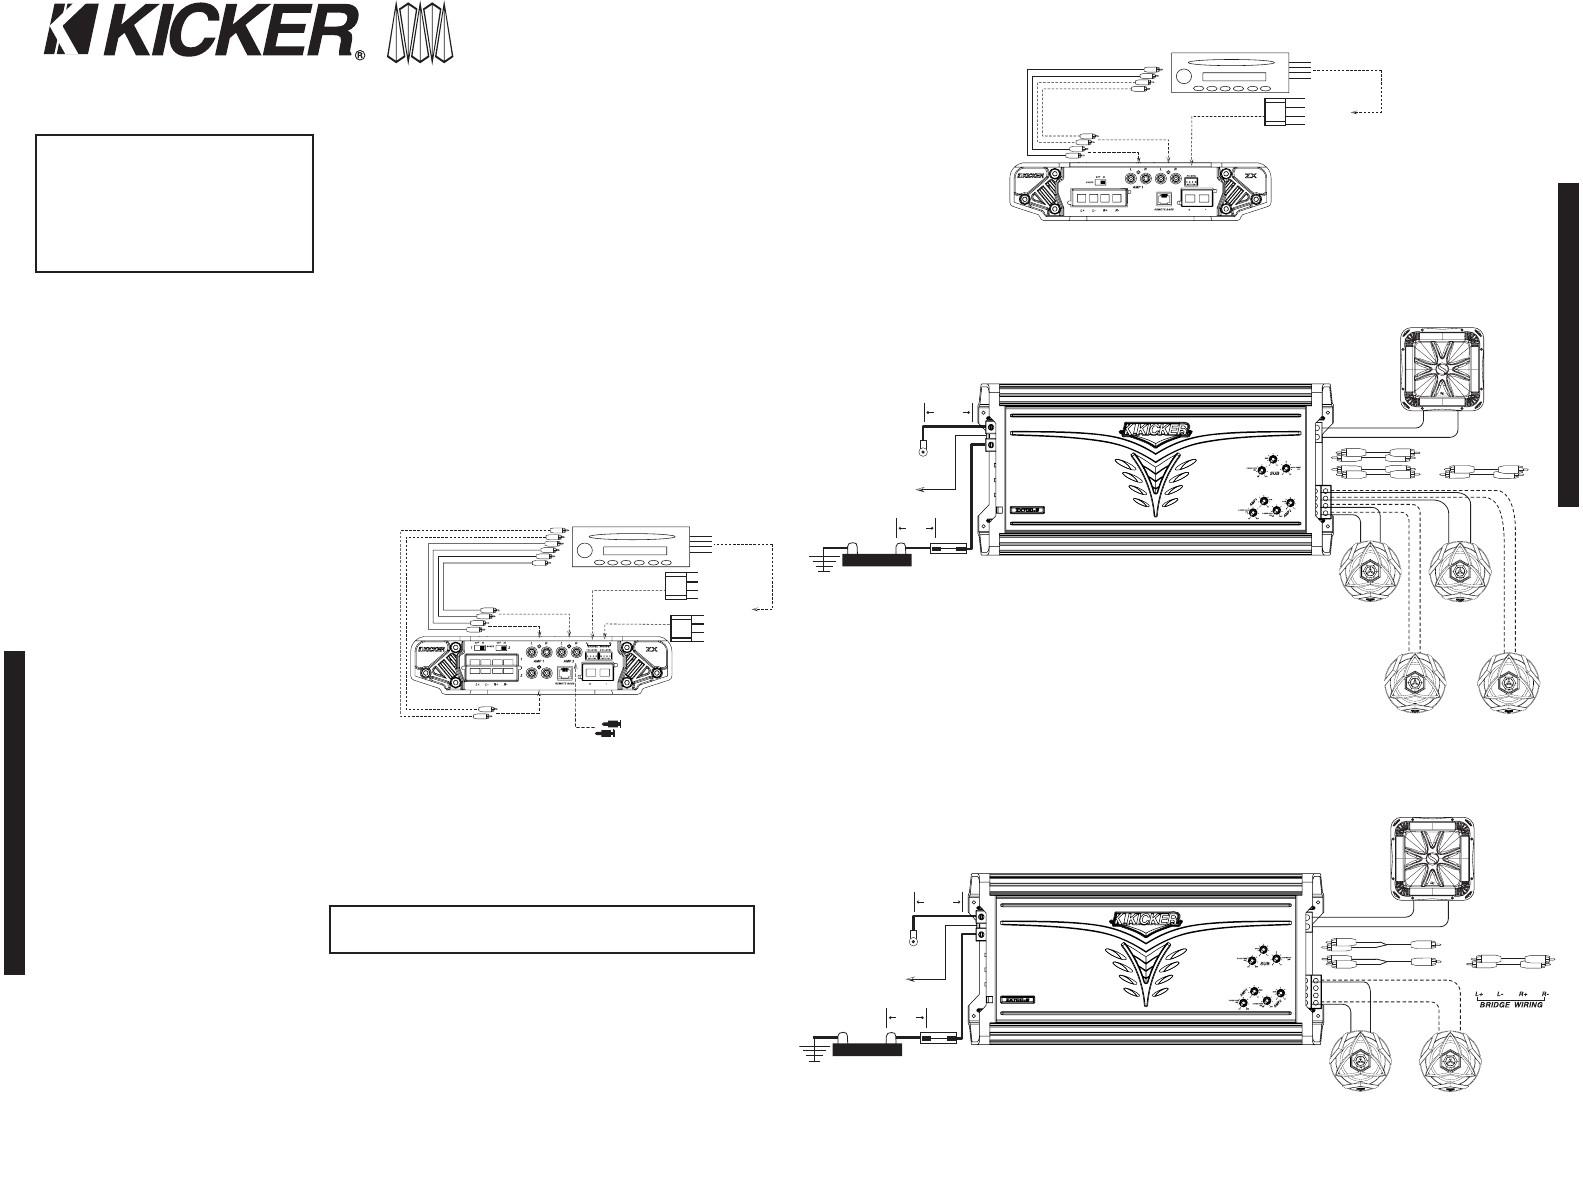 Kicker Kisl Wiring Diagram Collection | Wiring Diagram Sample - Kicker Wiring Diagram